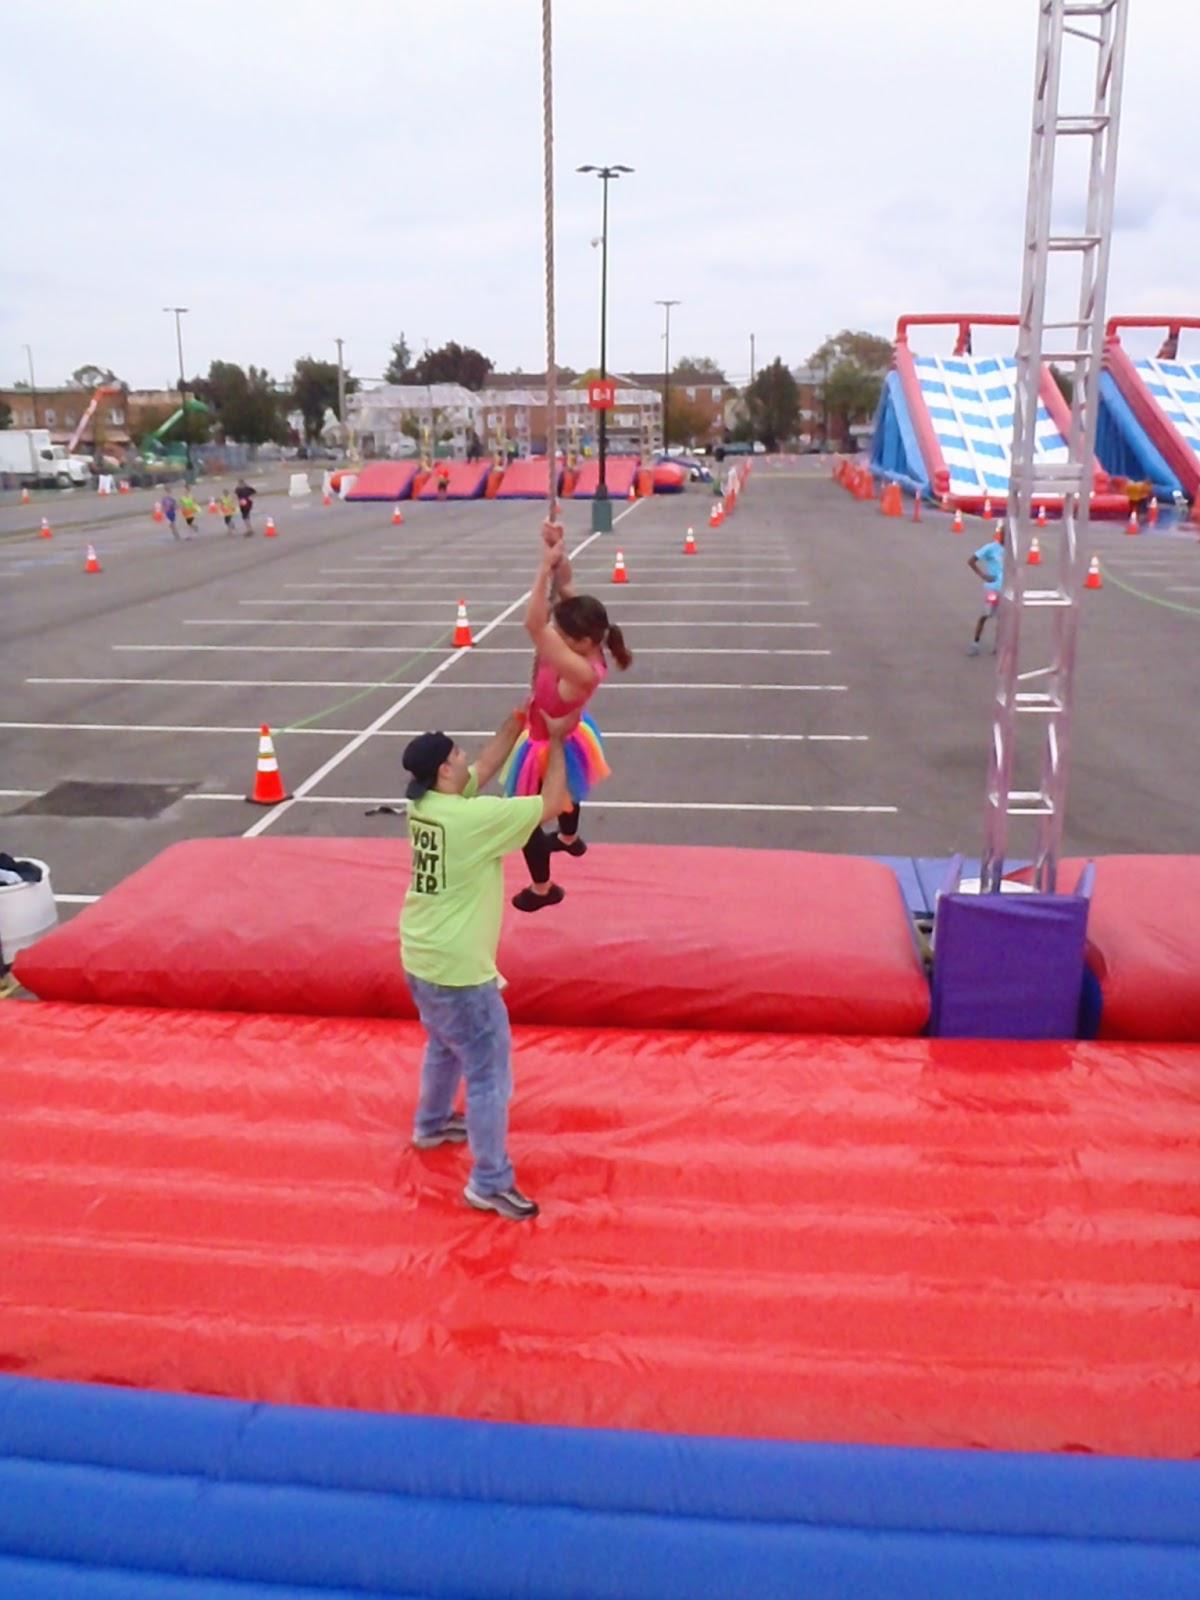 Ridiculous obstacle race tarzan swing